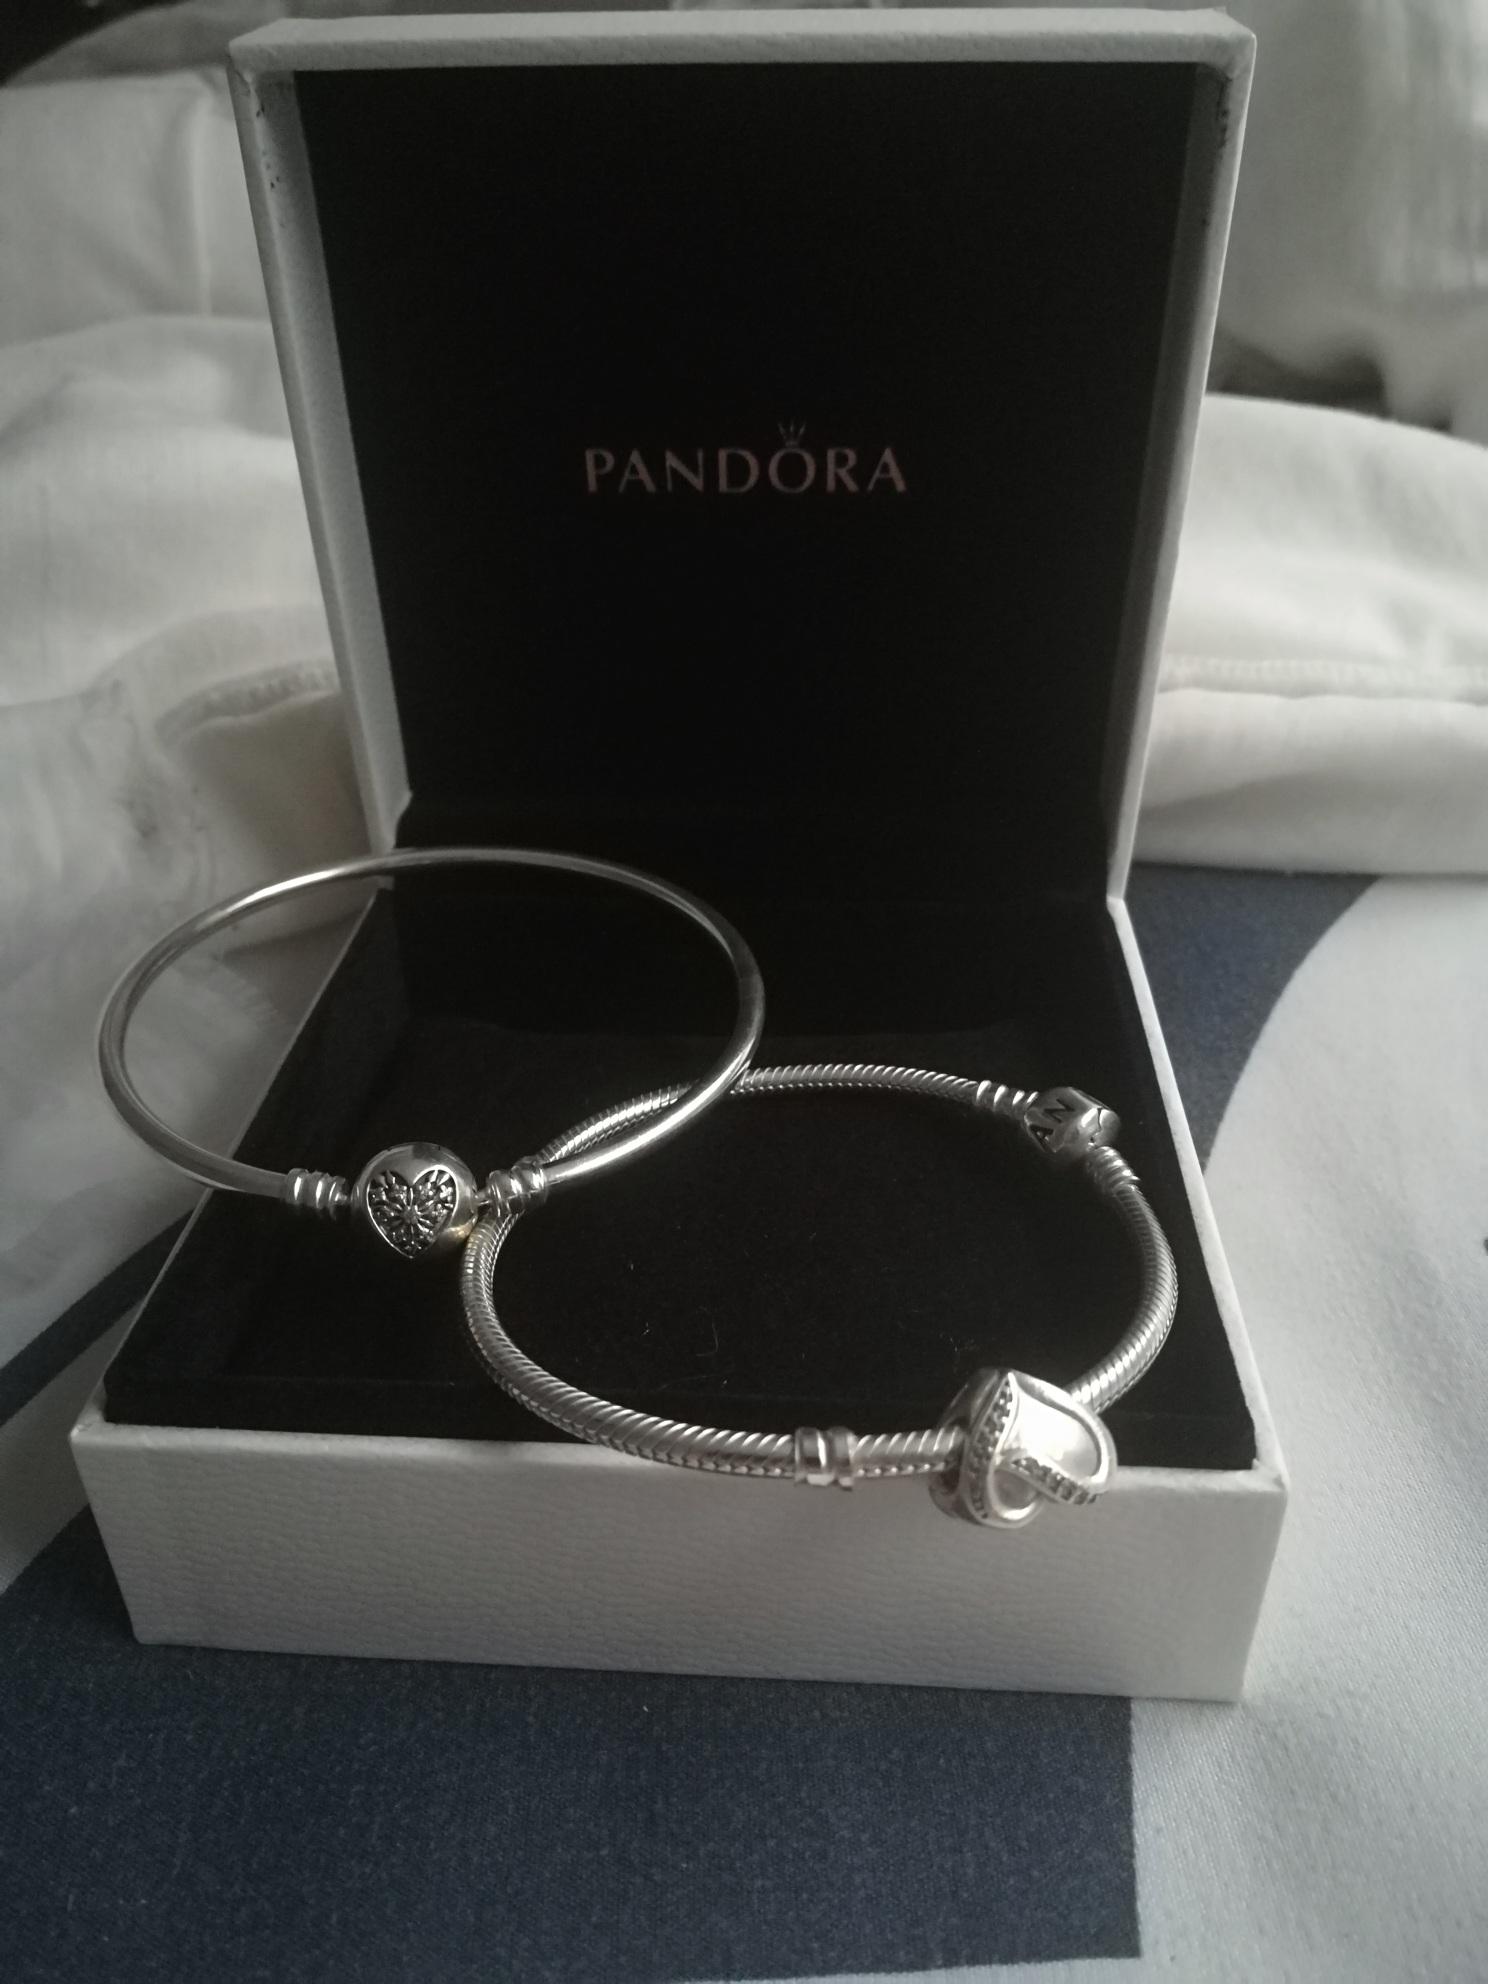 2 x Pandora bracelets with pendants